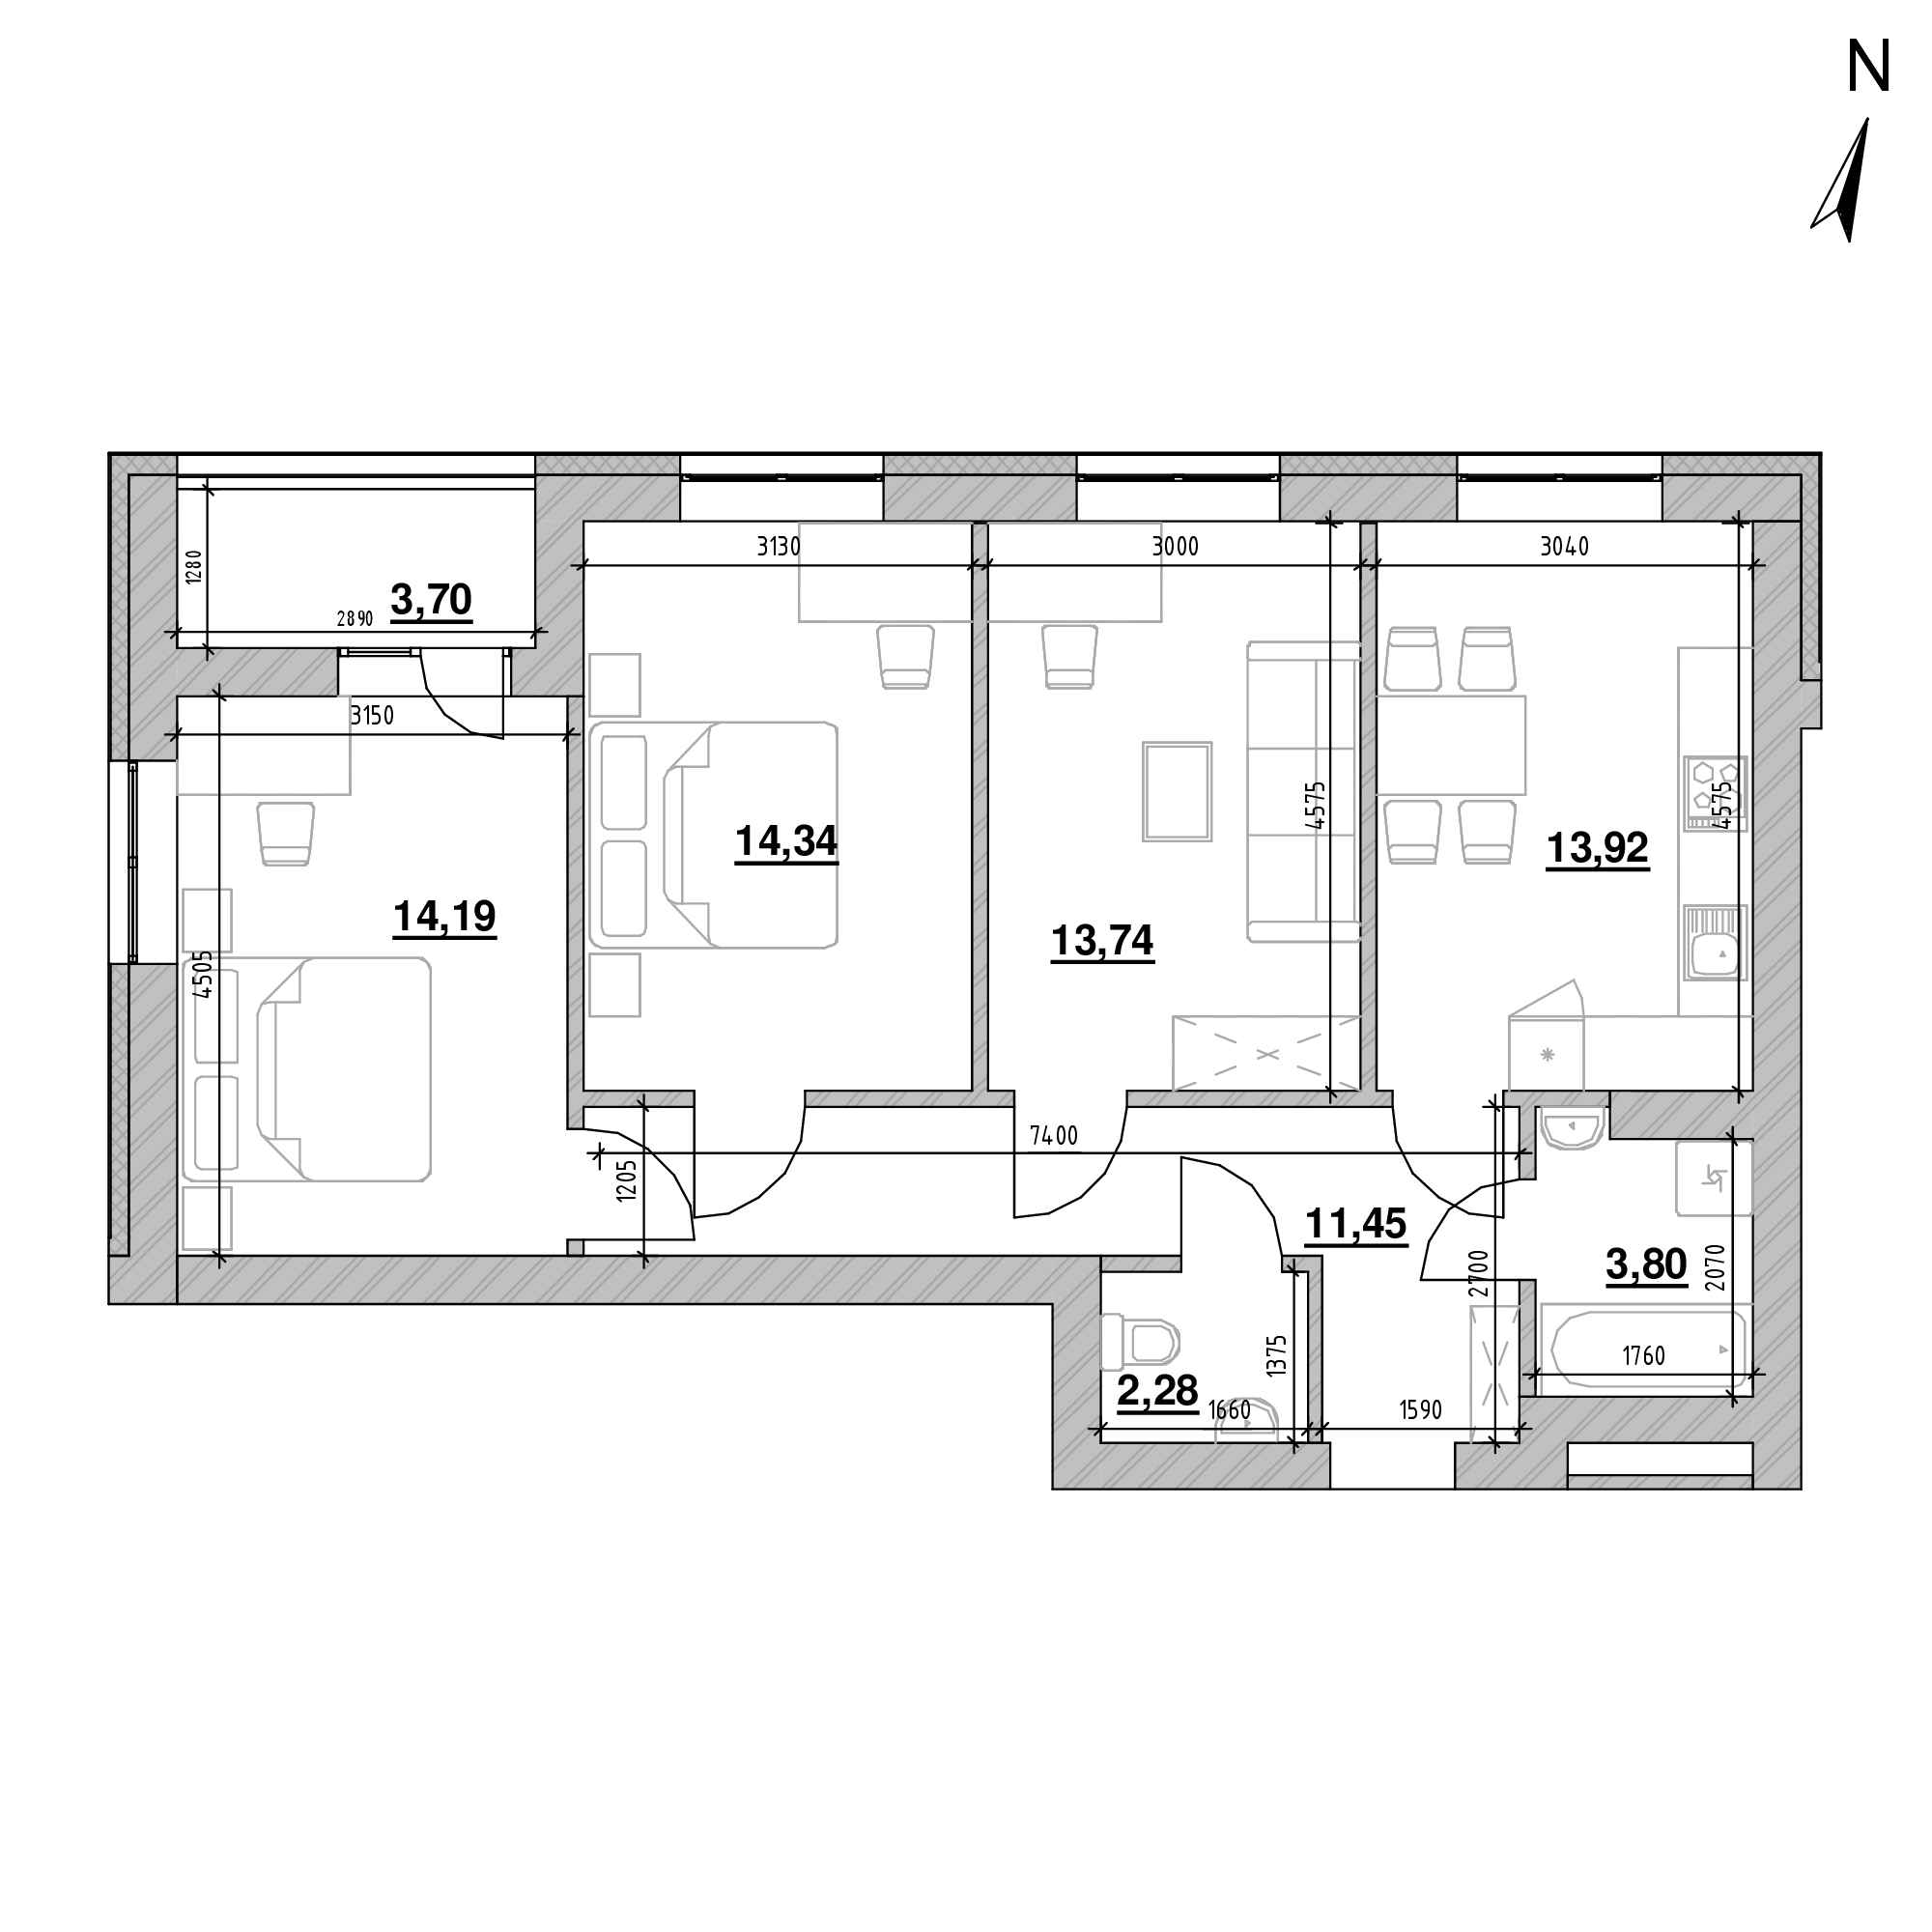 ЖК Шенген: планування 3-кімнатної квартири, №53а, 77.42 м<sup>2</sup>